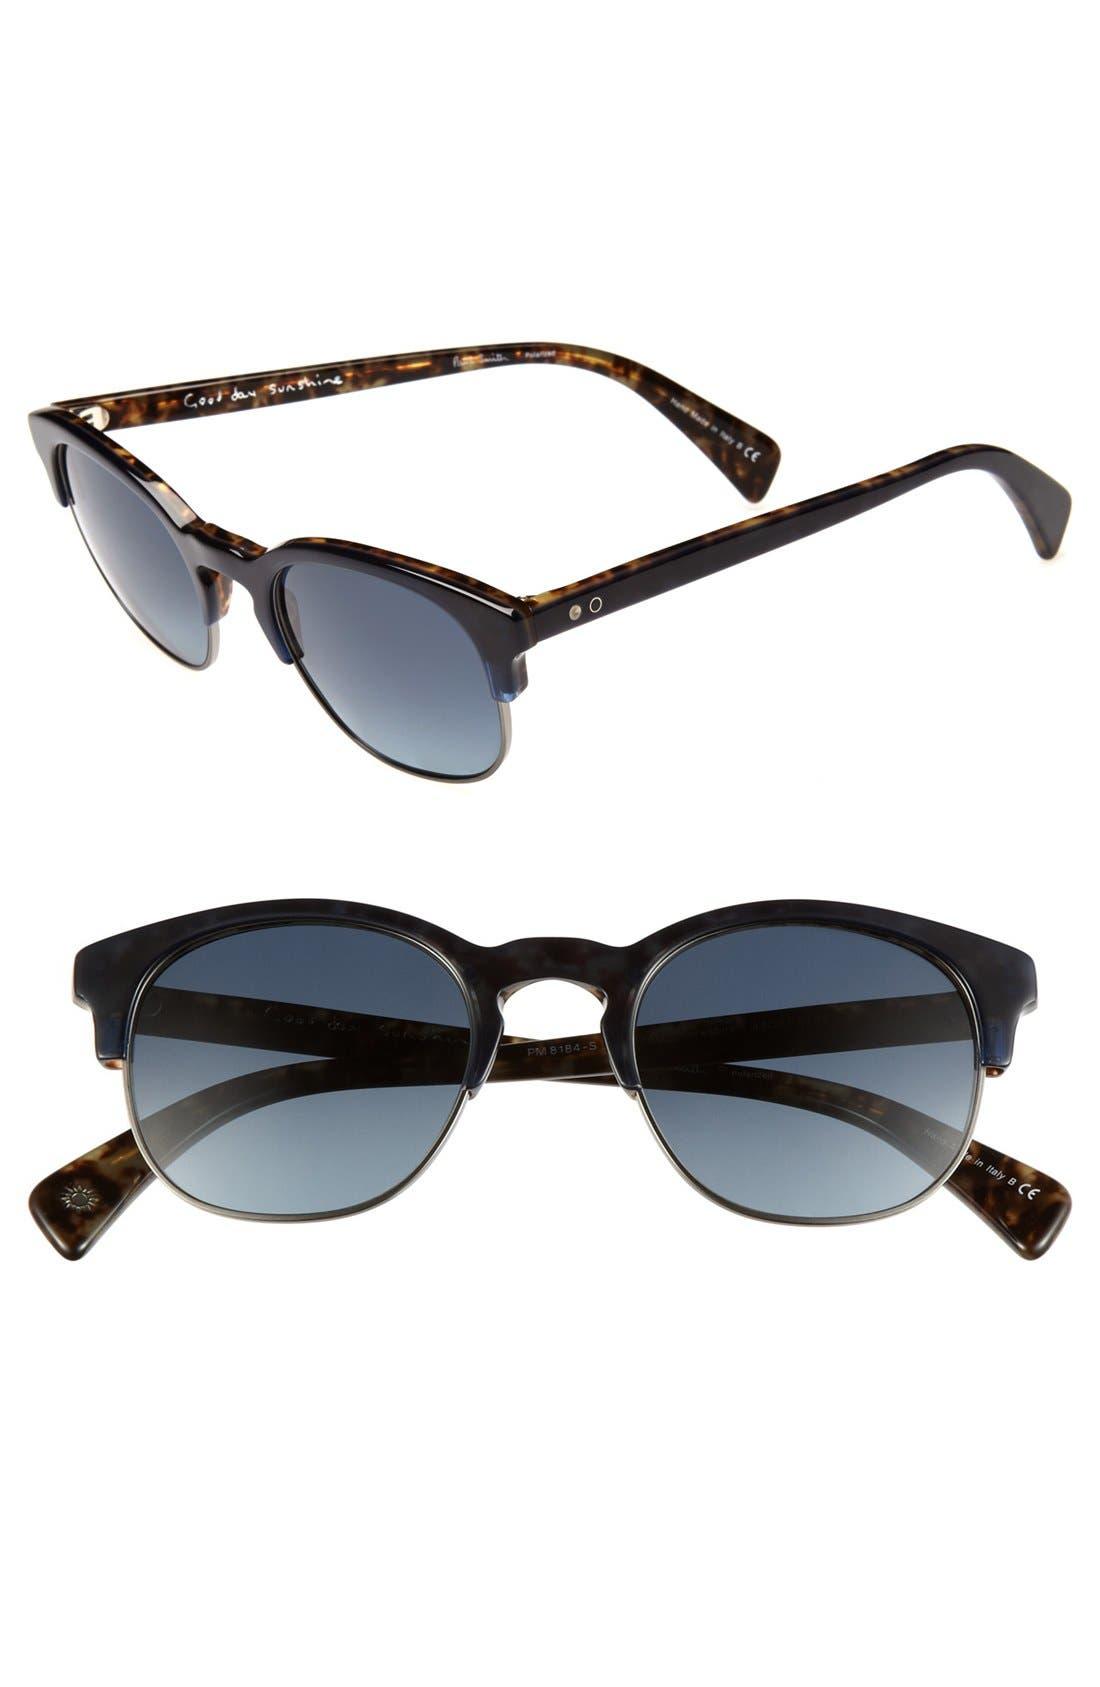 Alternate Image 1 Selected - Paul Smith 'Yorkshire' 49mm Polarized Sunglasses